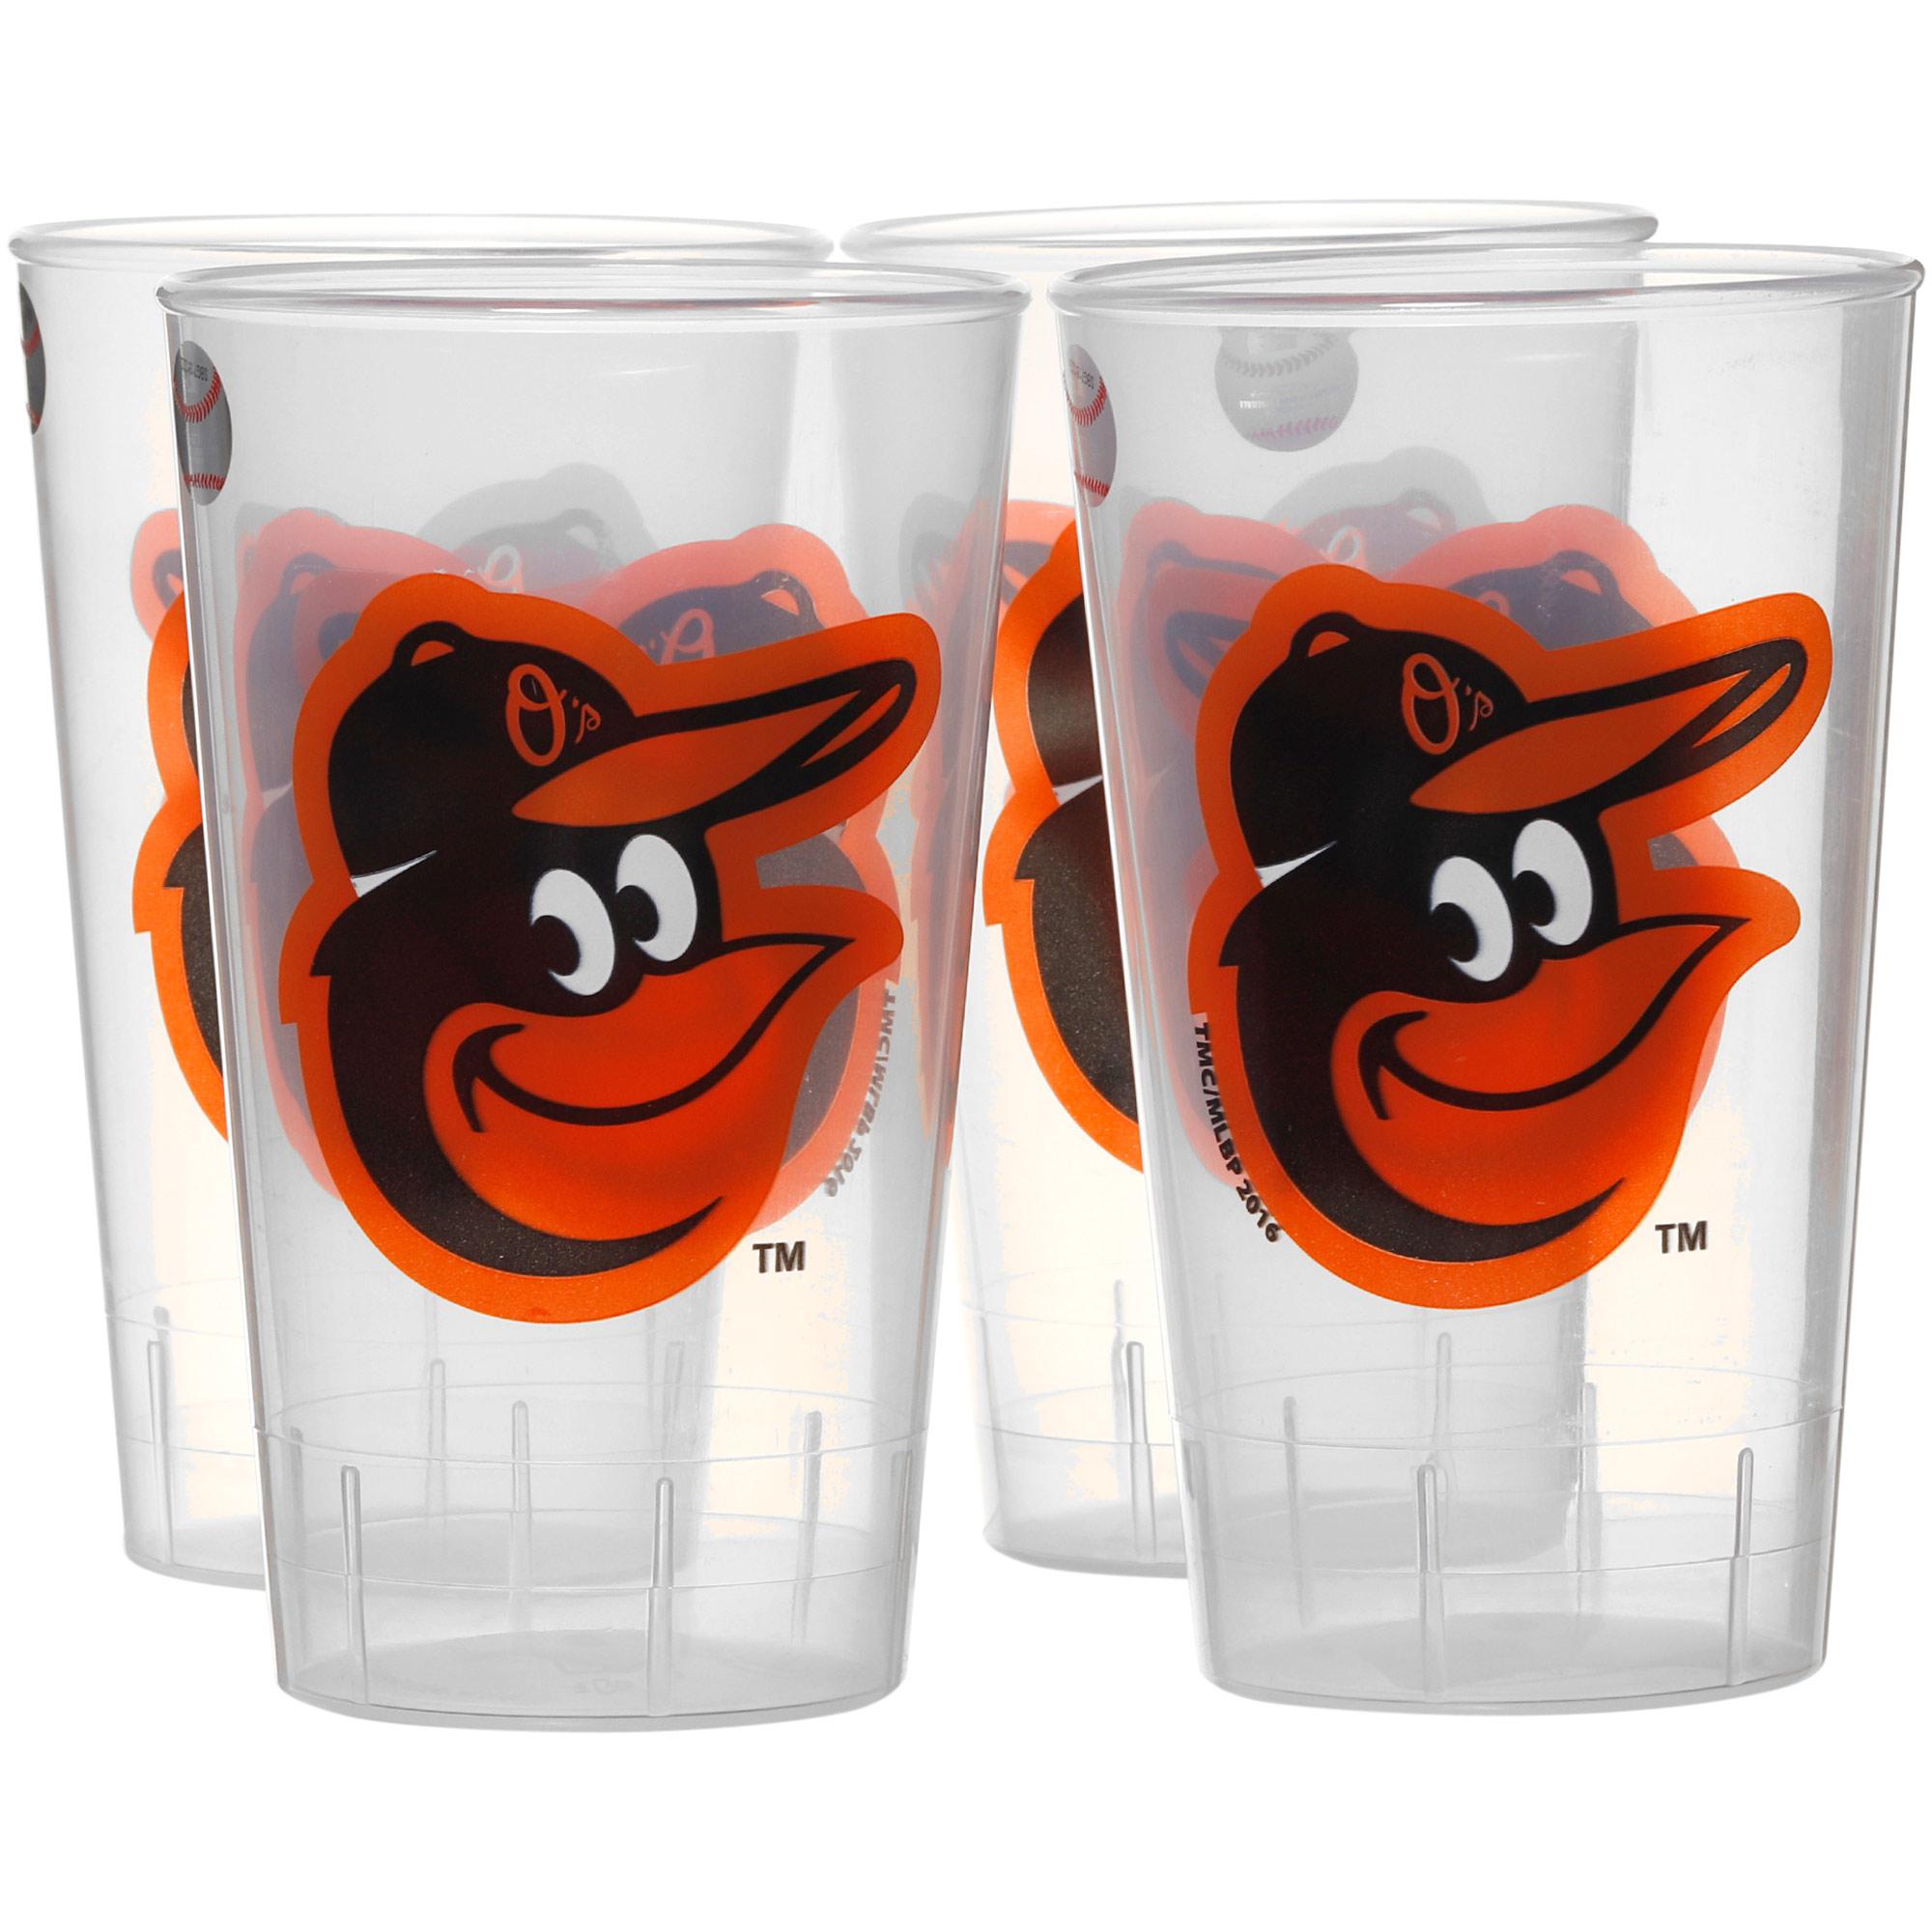 Baltimore Orioles 16oz. Acrylic Tumblers 4-Pack Set - No Size